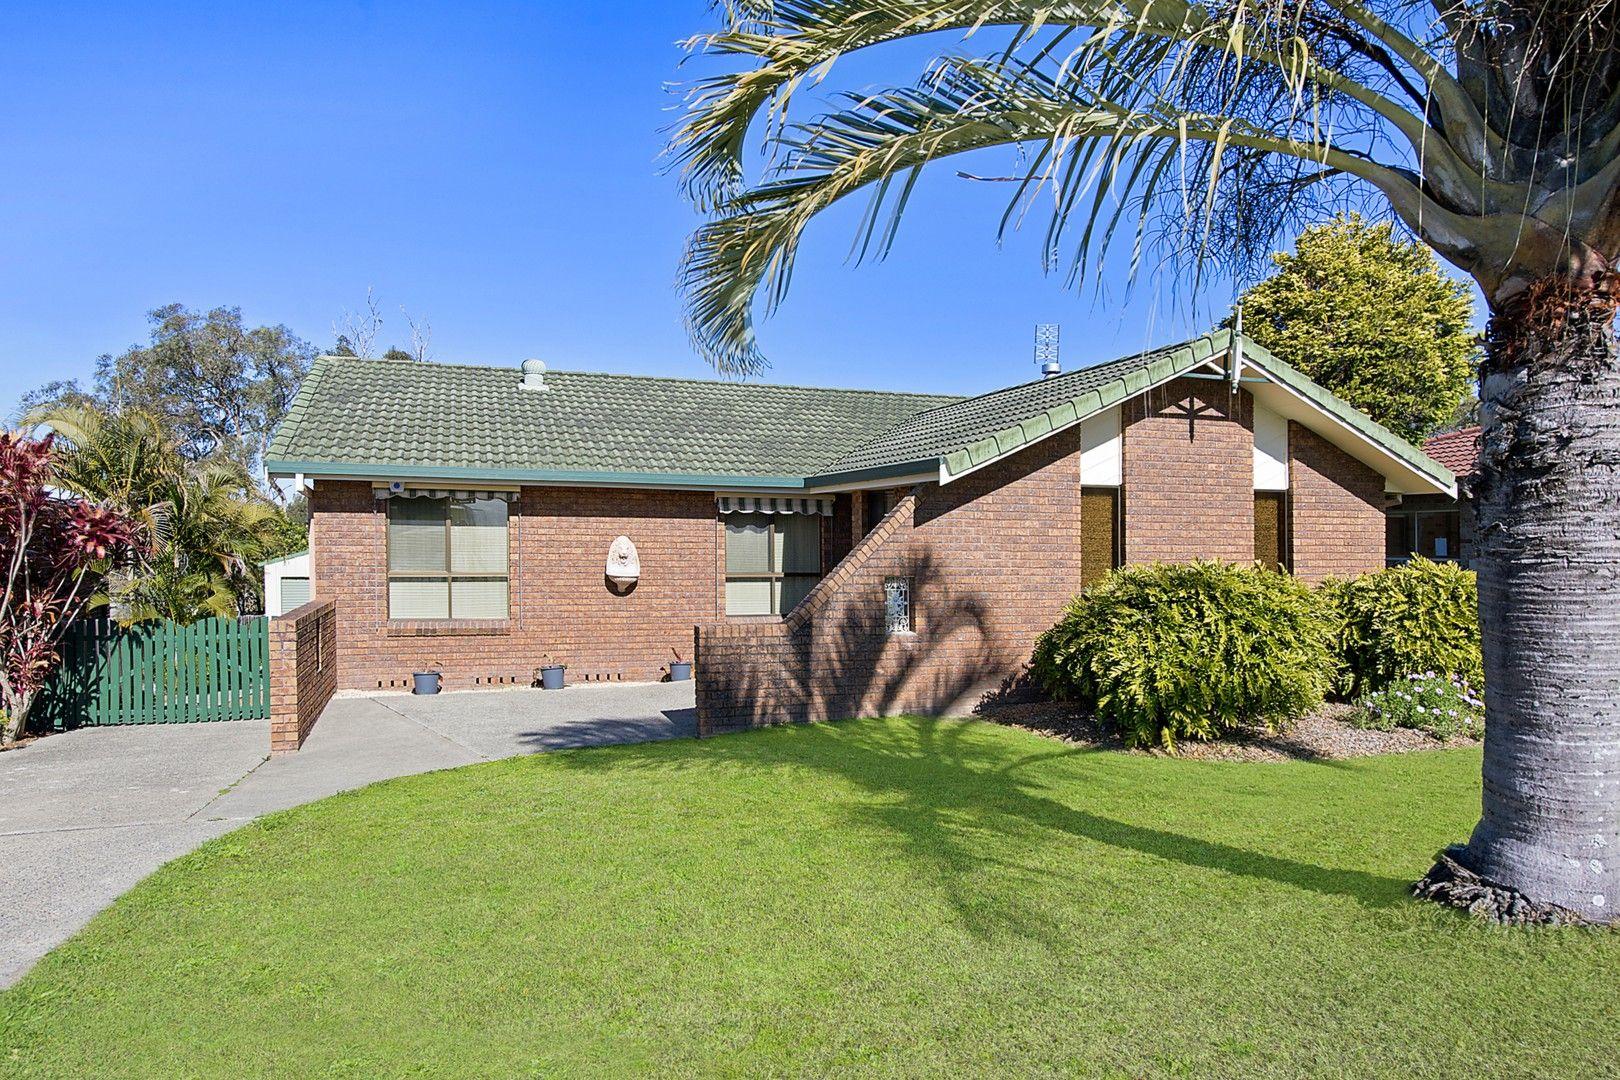 28 MITCHELL AVENUE, West Kempsey NSW 2440, Image 0